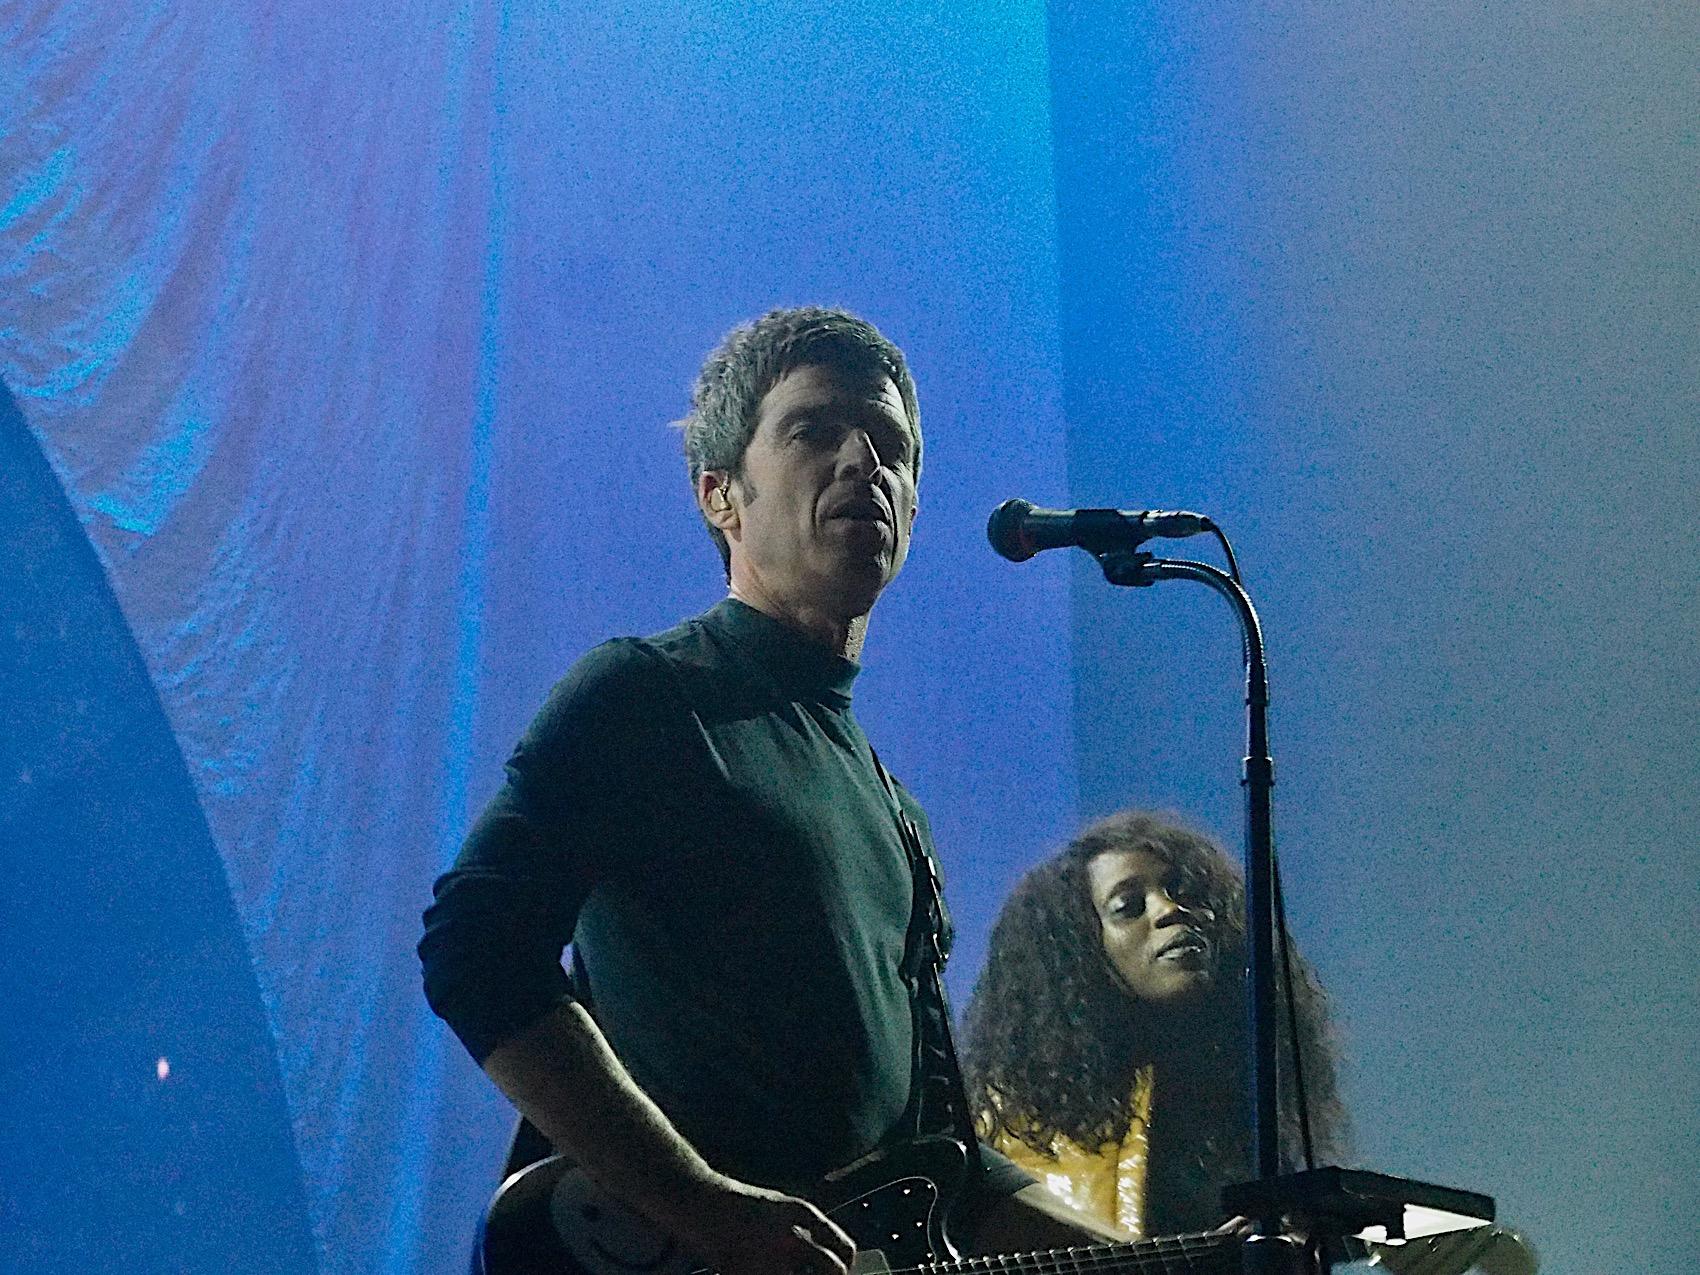 Noel Gallagher - Berlin, 16.04.2018 - Foto: Olli Exner